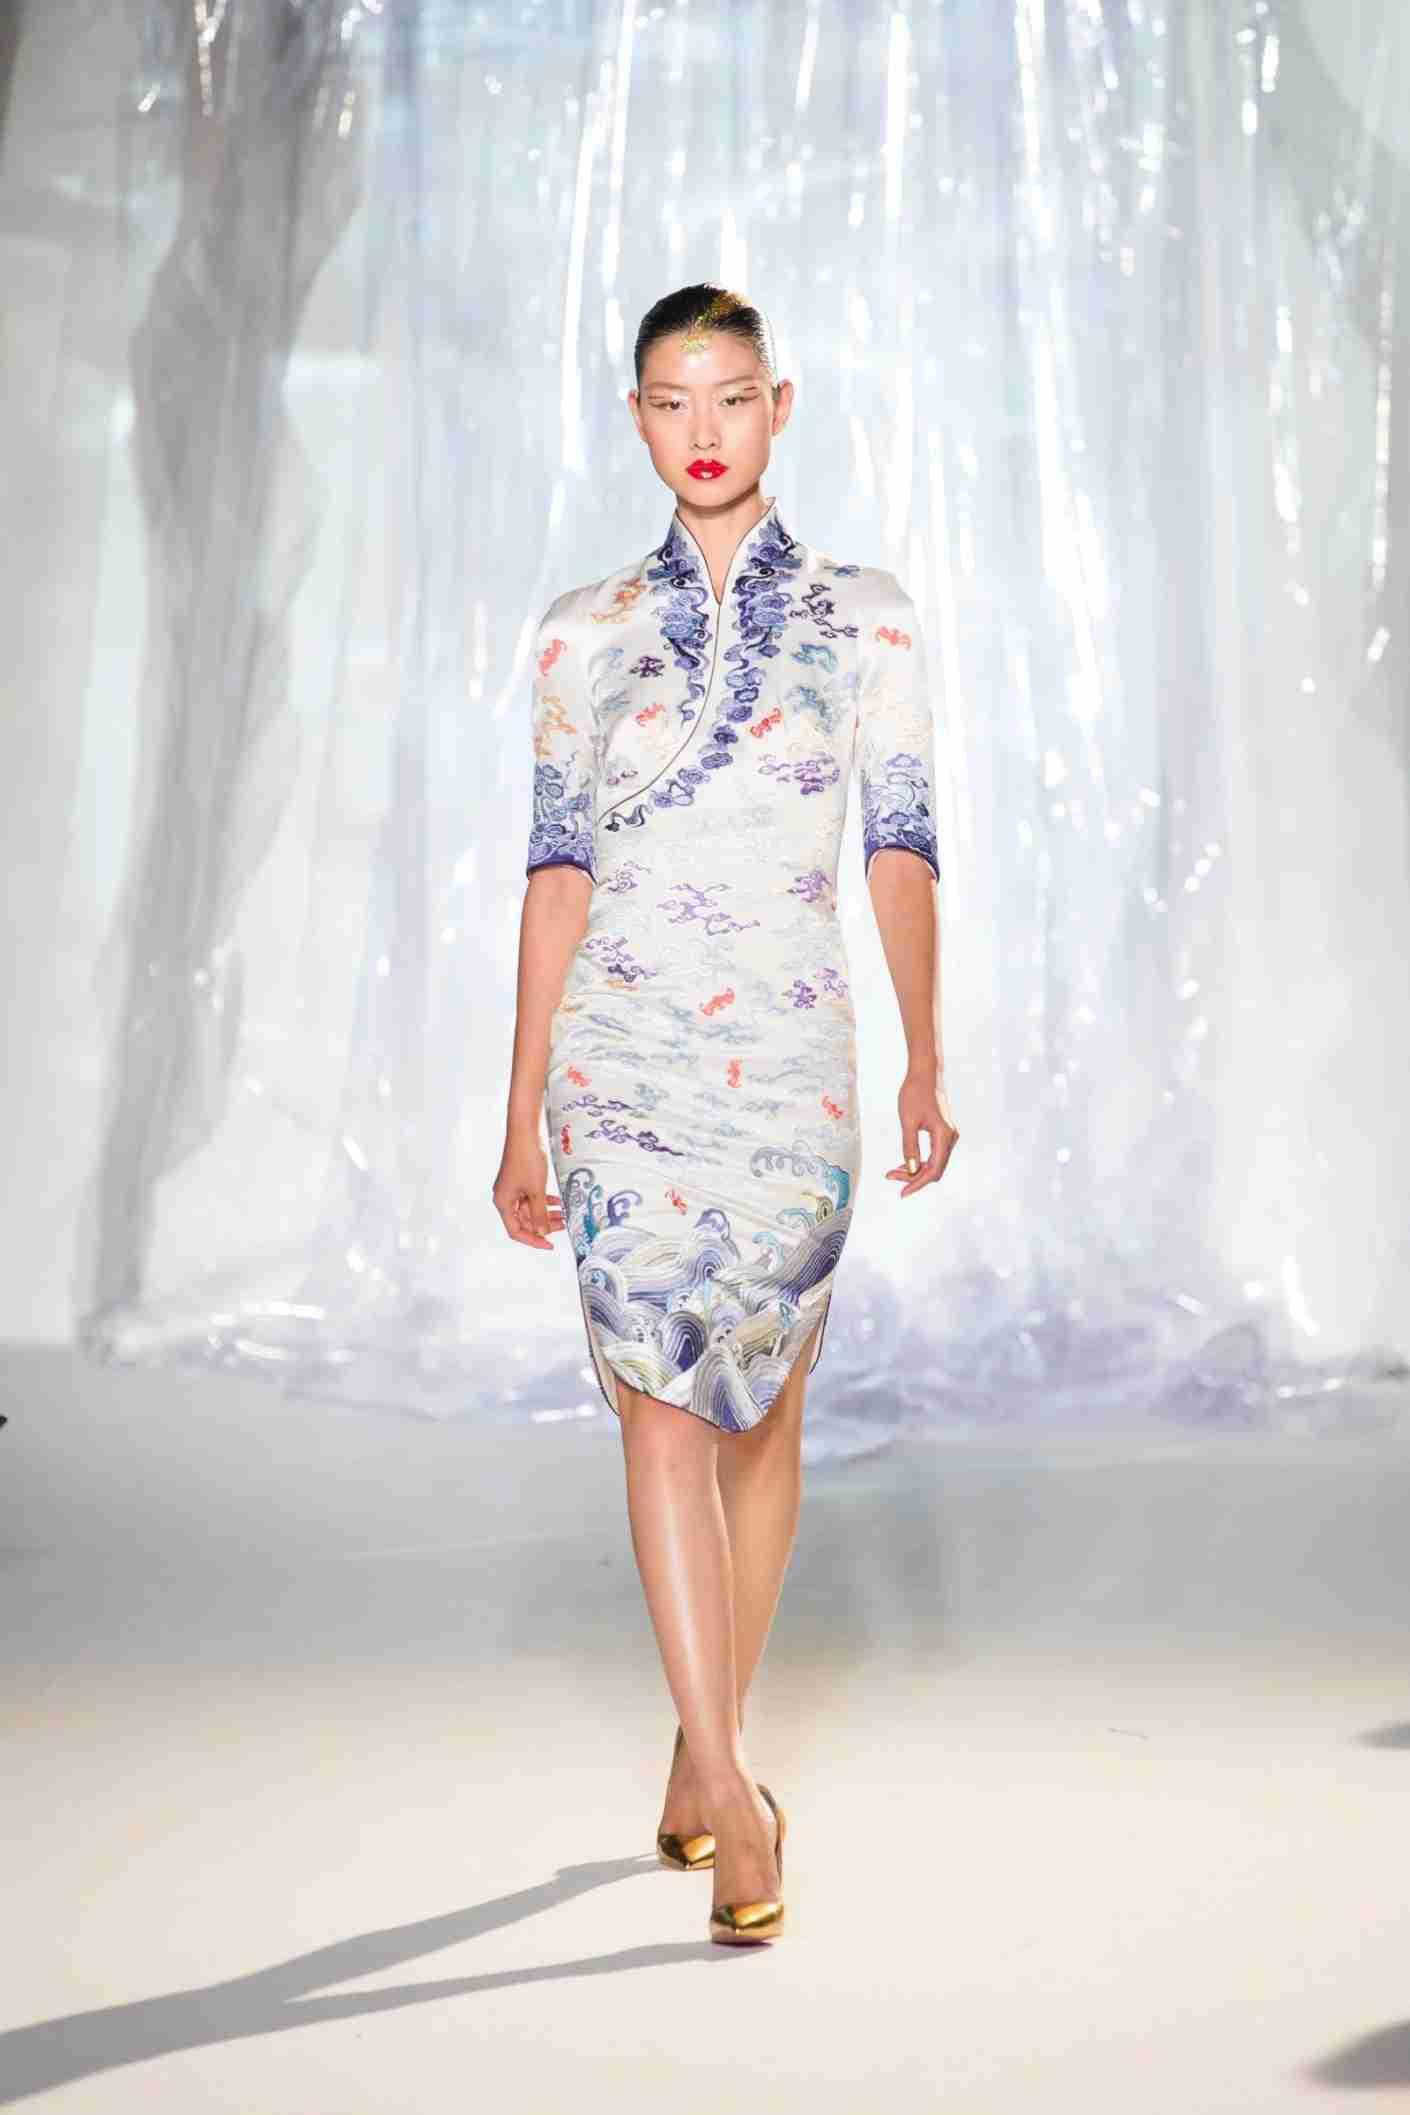 Hainan Airlines New Uniform - Female Cheongsam (PRNewsfoto/Hainan Airlines Holding Co., LT)